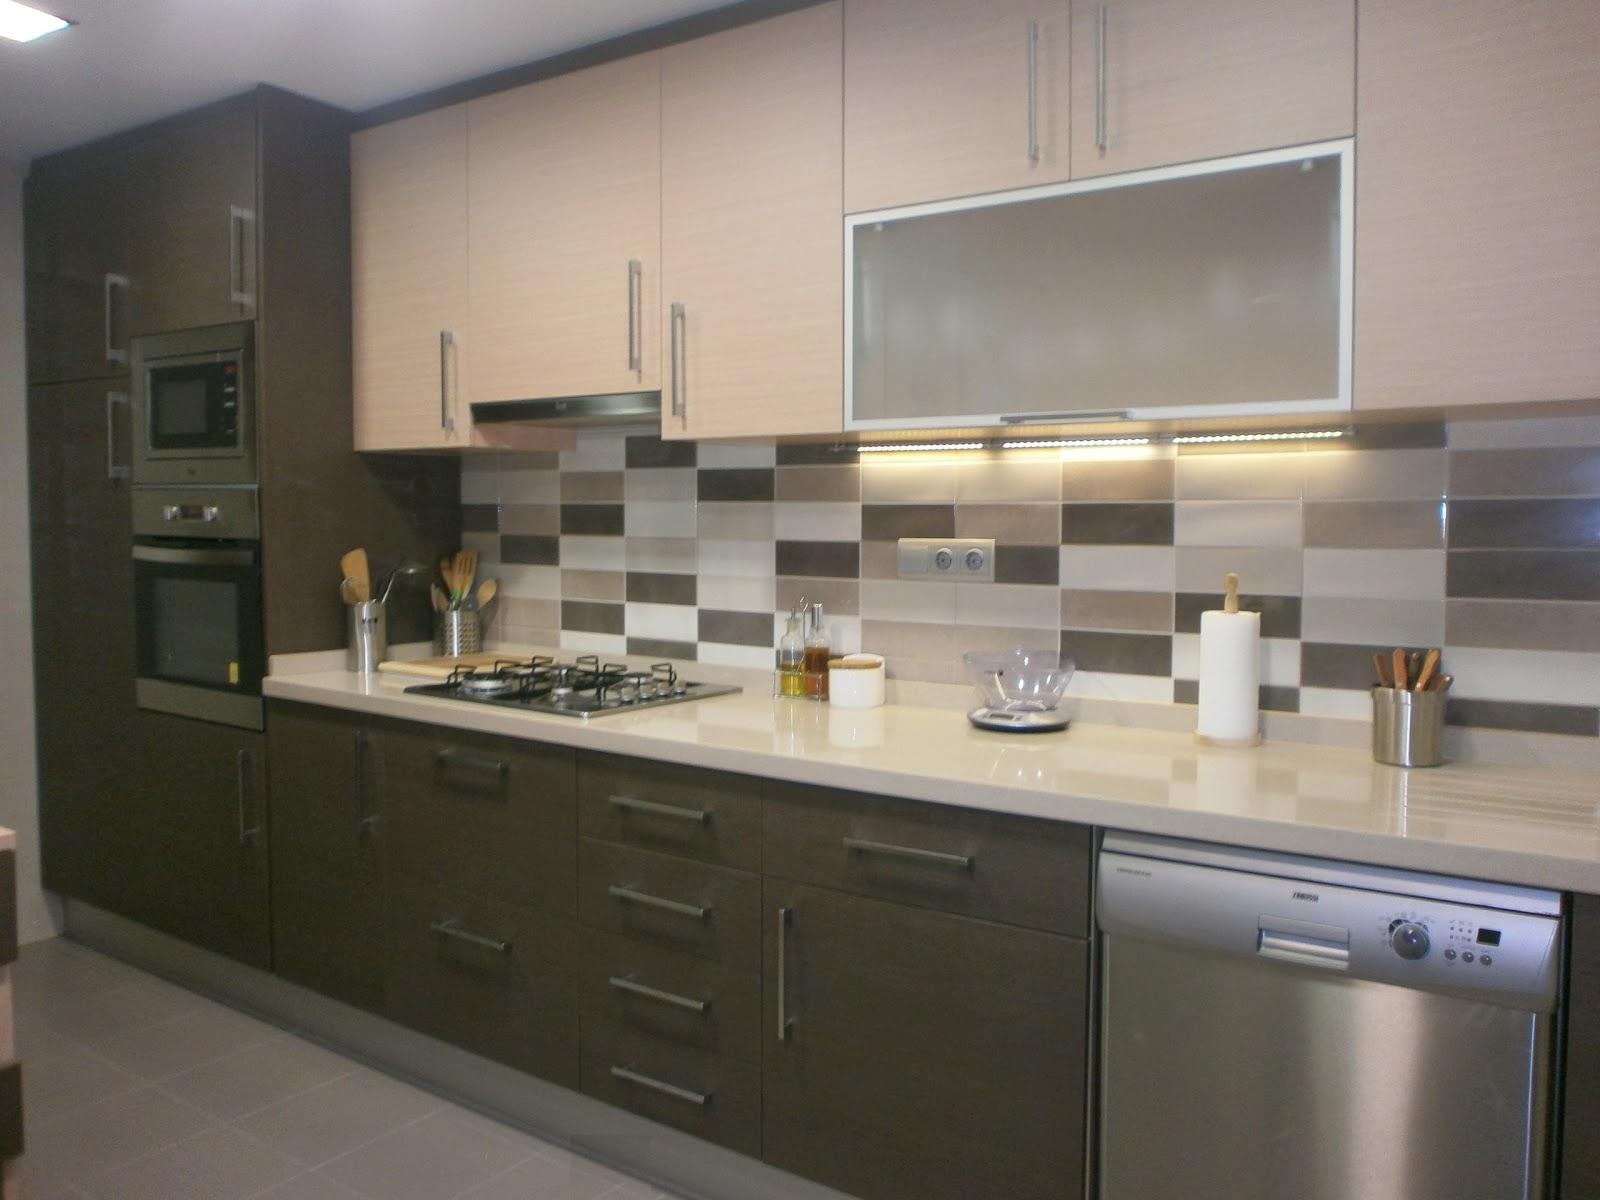 Dise o intemporal una sobria cocina en dos tonos cocinas con estilo - Azulejos para cocina modernos ...